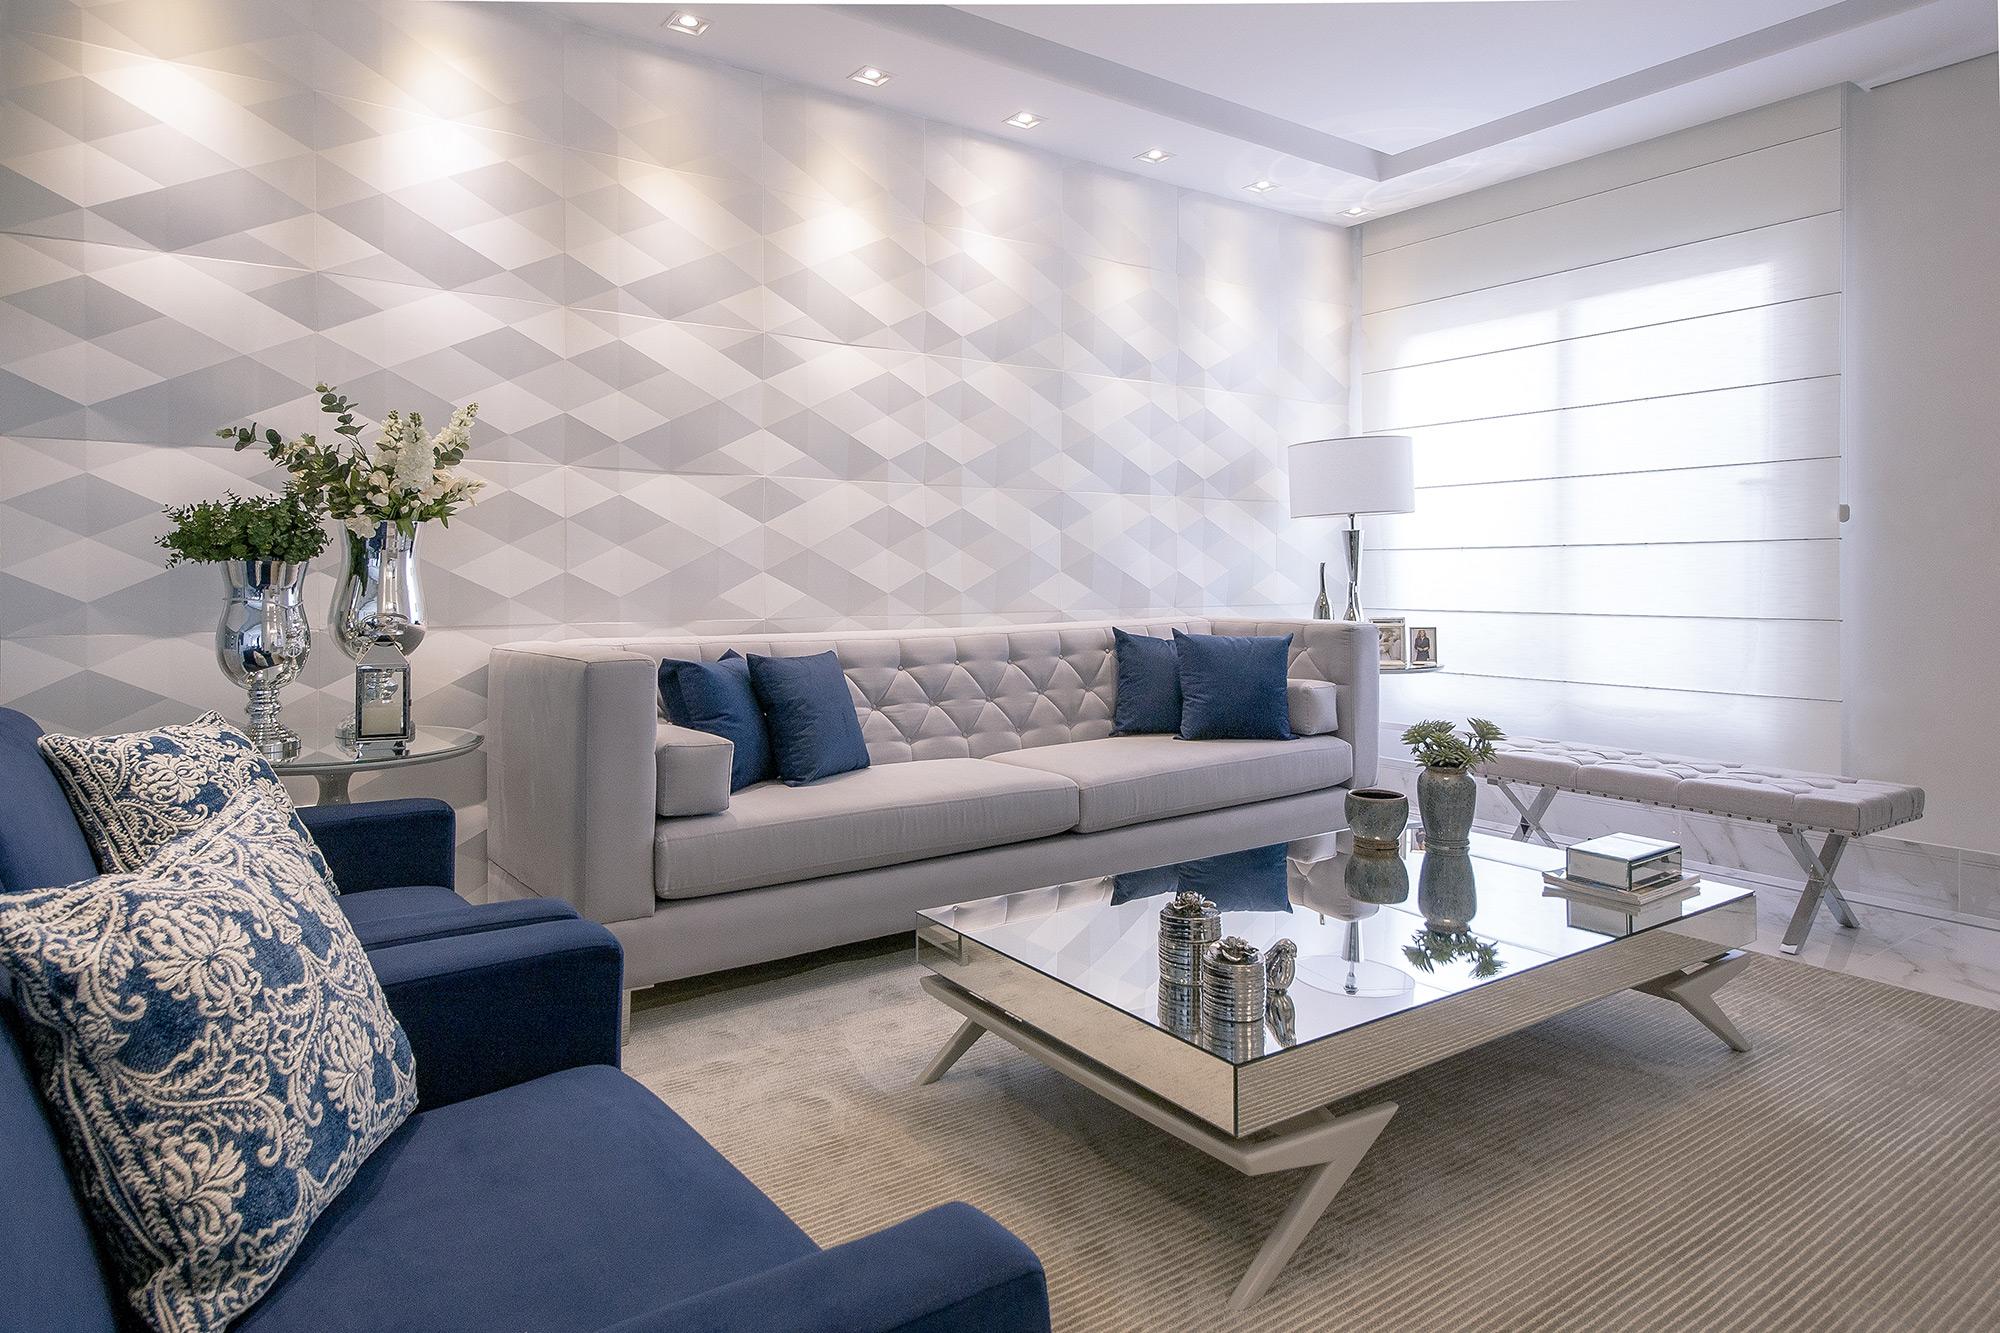 Sala de Estar revestida com Dyamante Branco, no projeto da Arquiteta Fernanda Burger. Foto de Julio Buccier